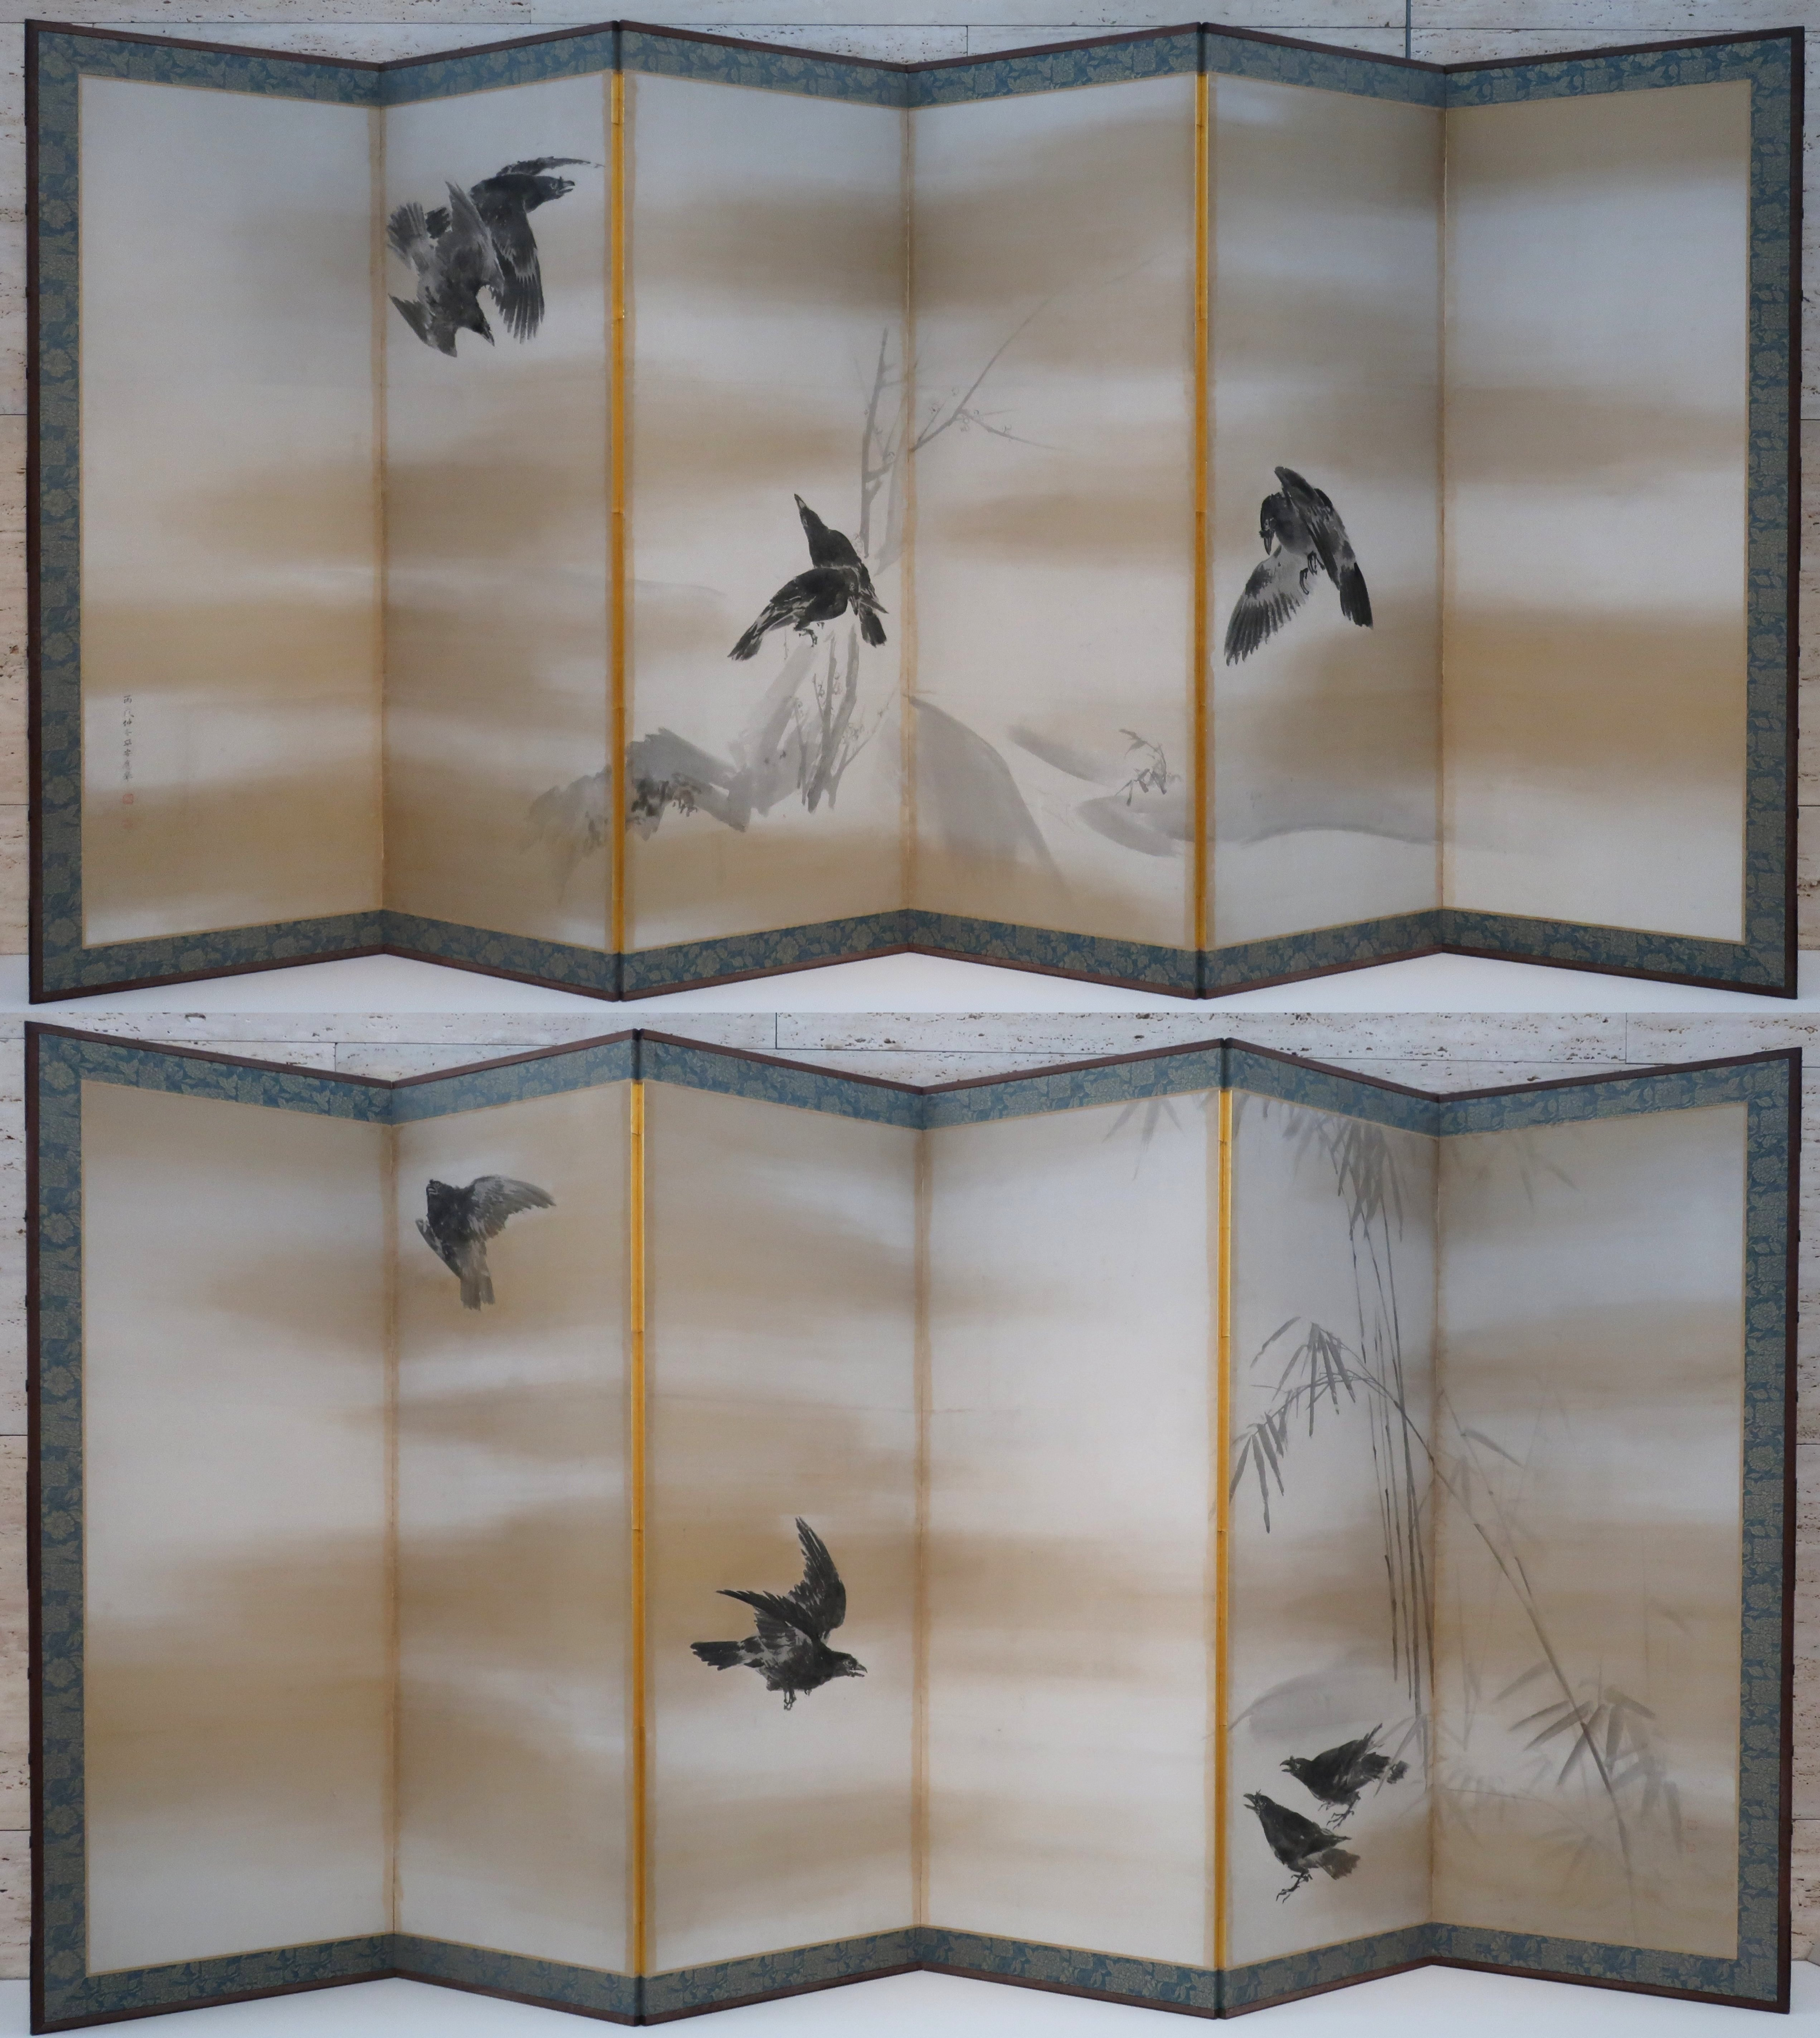 File:'Crows' by Maruyama Okyo.jpg